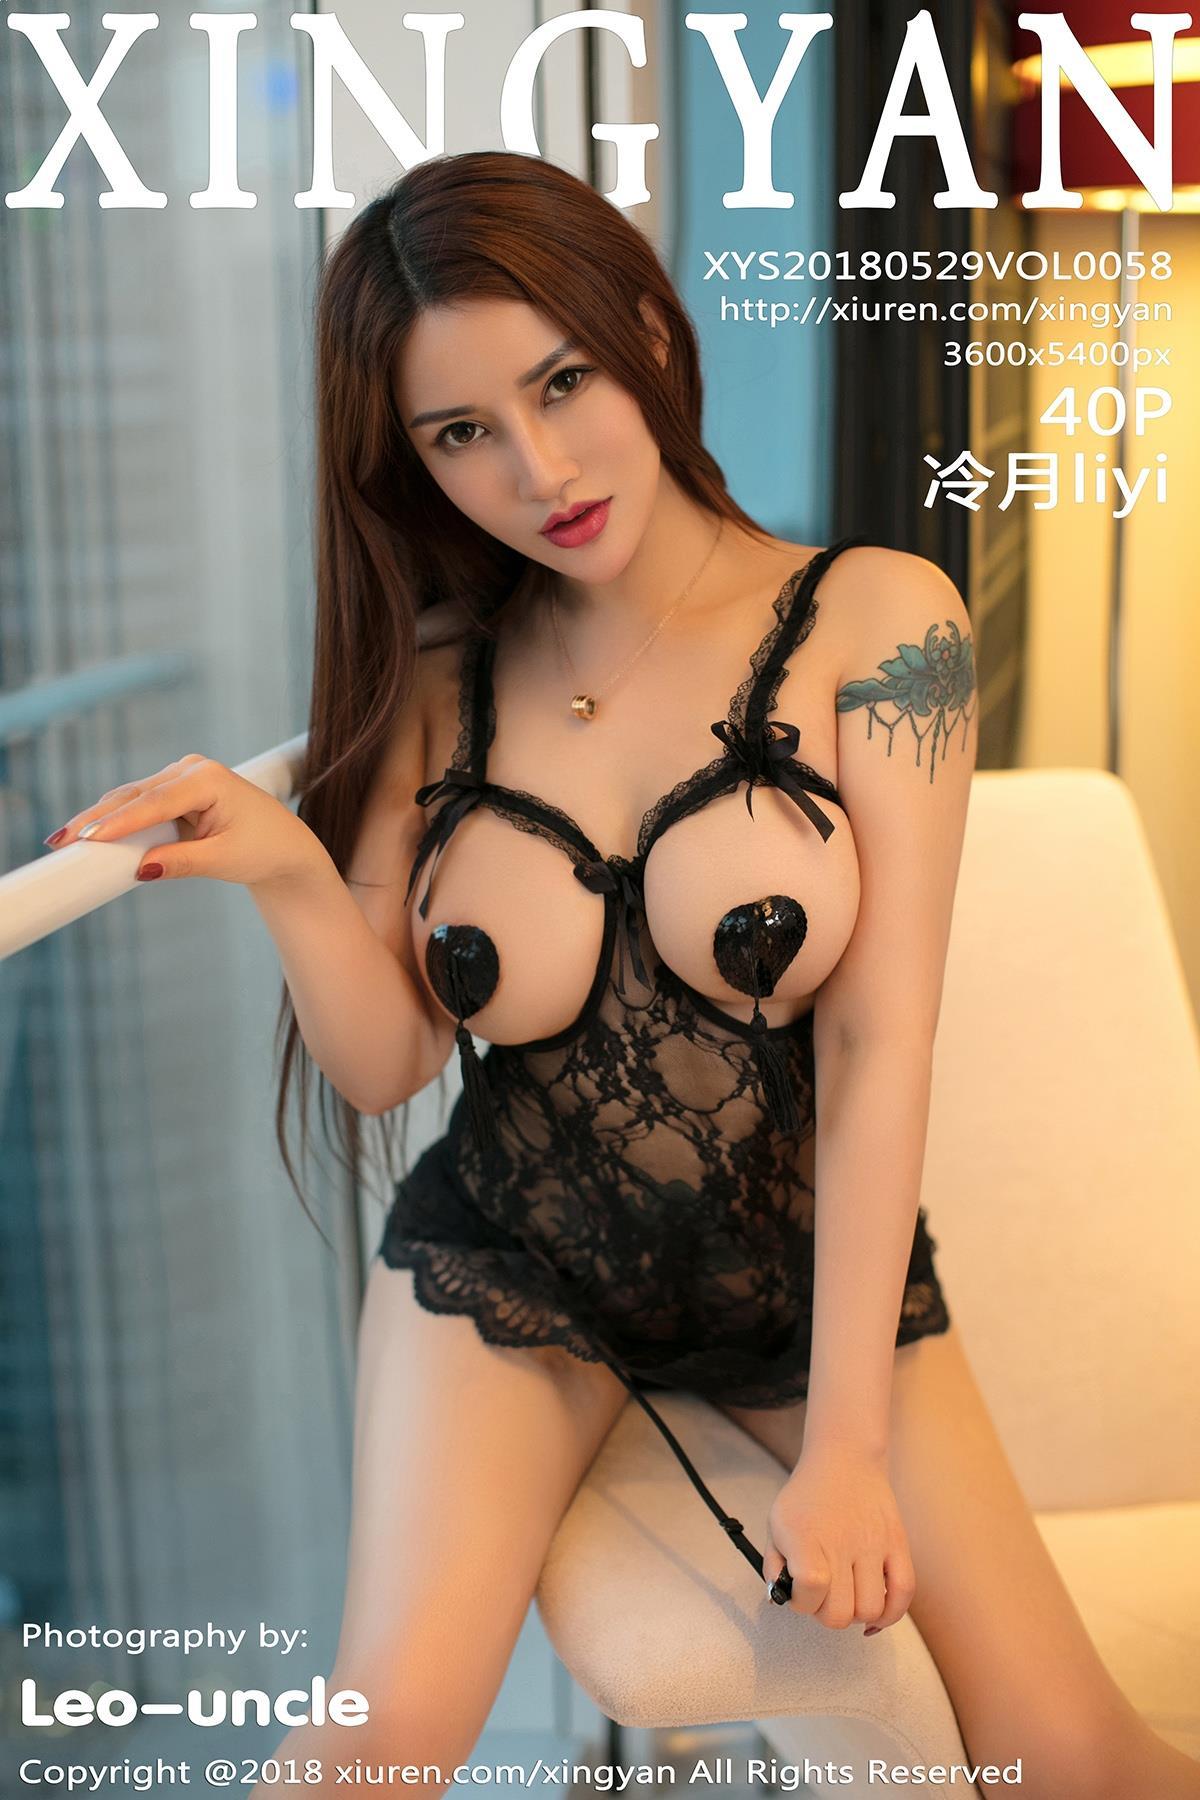 [XINGYAN星颜社]XYS20180529VOL0058 冷月liyi 黑色情趣蕾丝镂空睡衣裙性感私房写真集